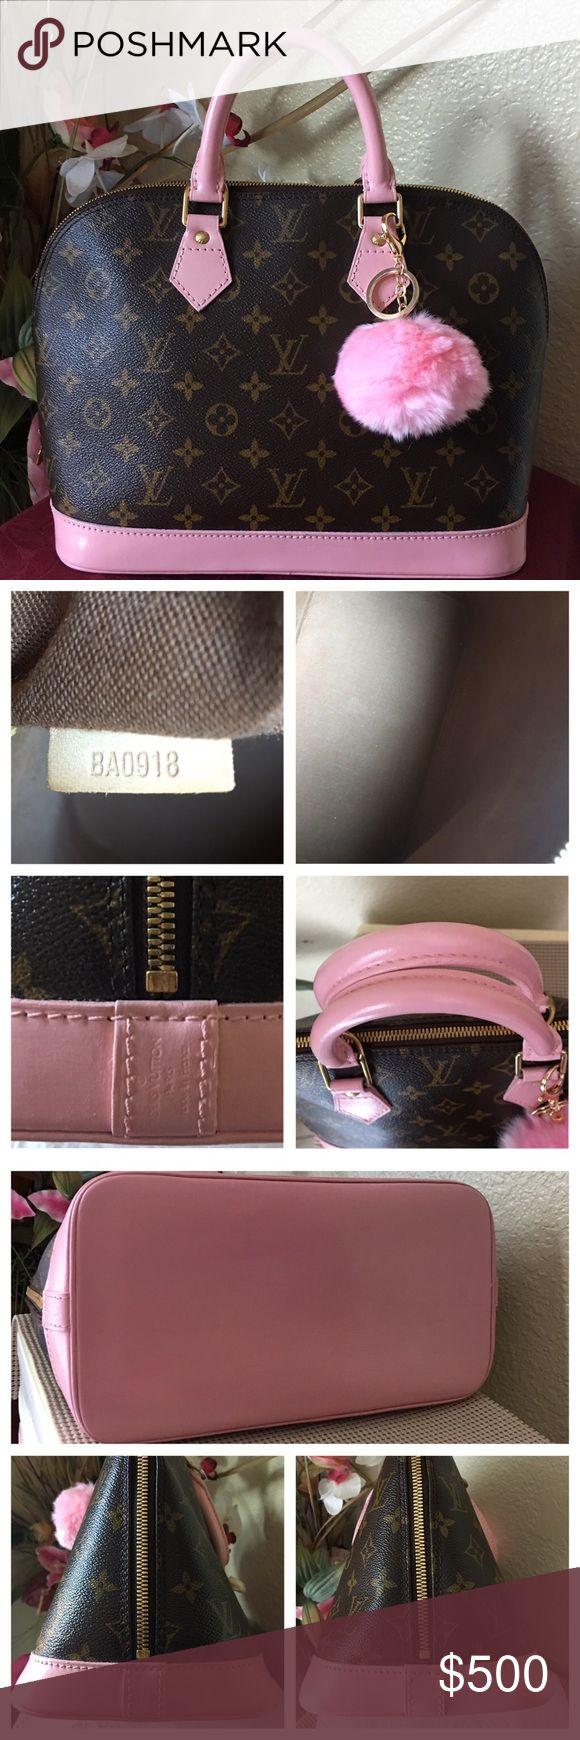 Spotted while shopping on Poshmark: SOLD! Authentic Louis Vuitton Alma PM! #poshmark #fashion #shopping #style #Louis Vuitton #Handbags